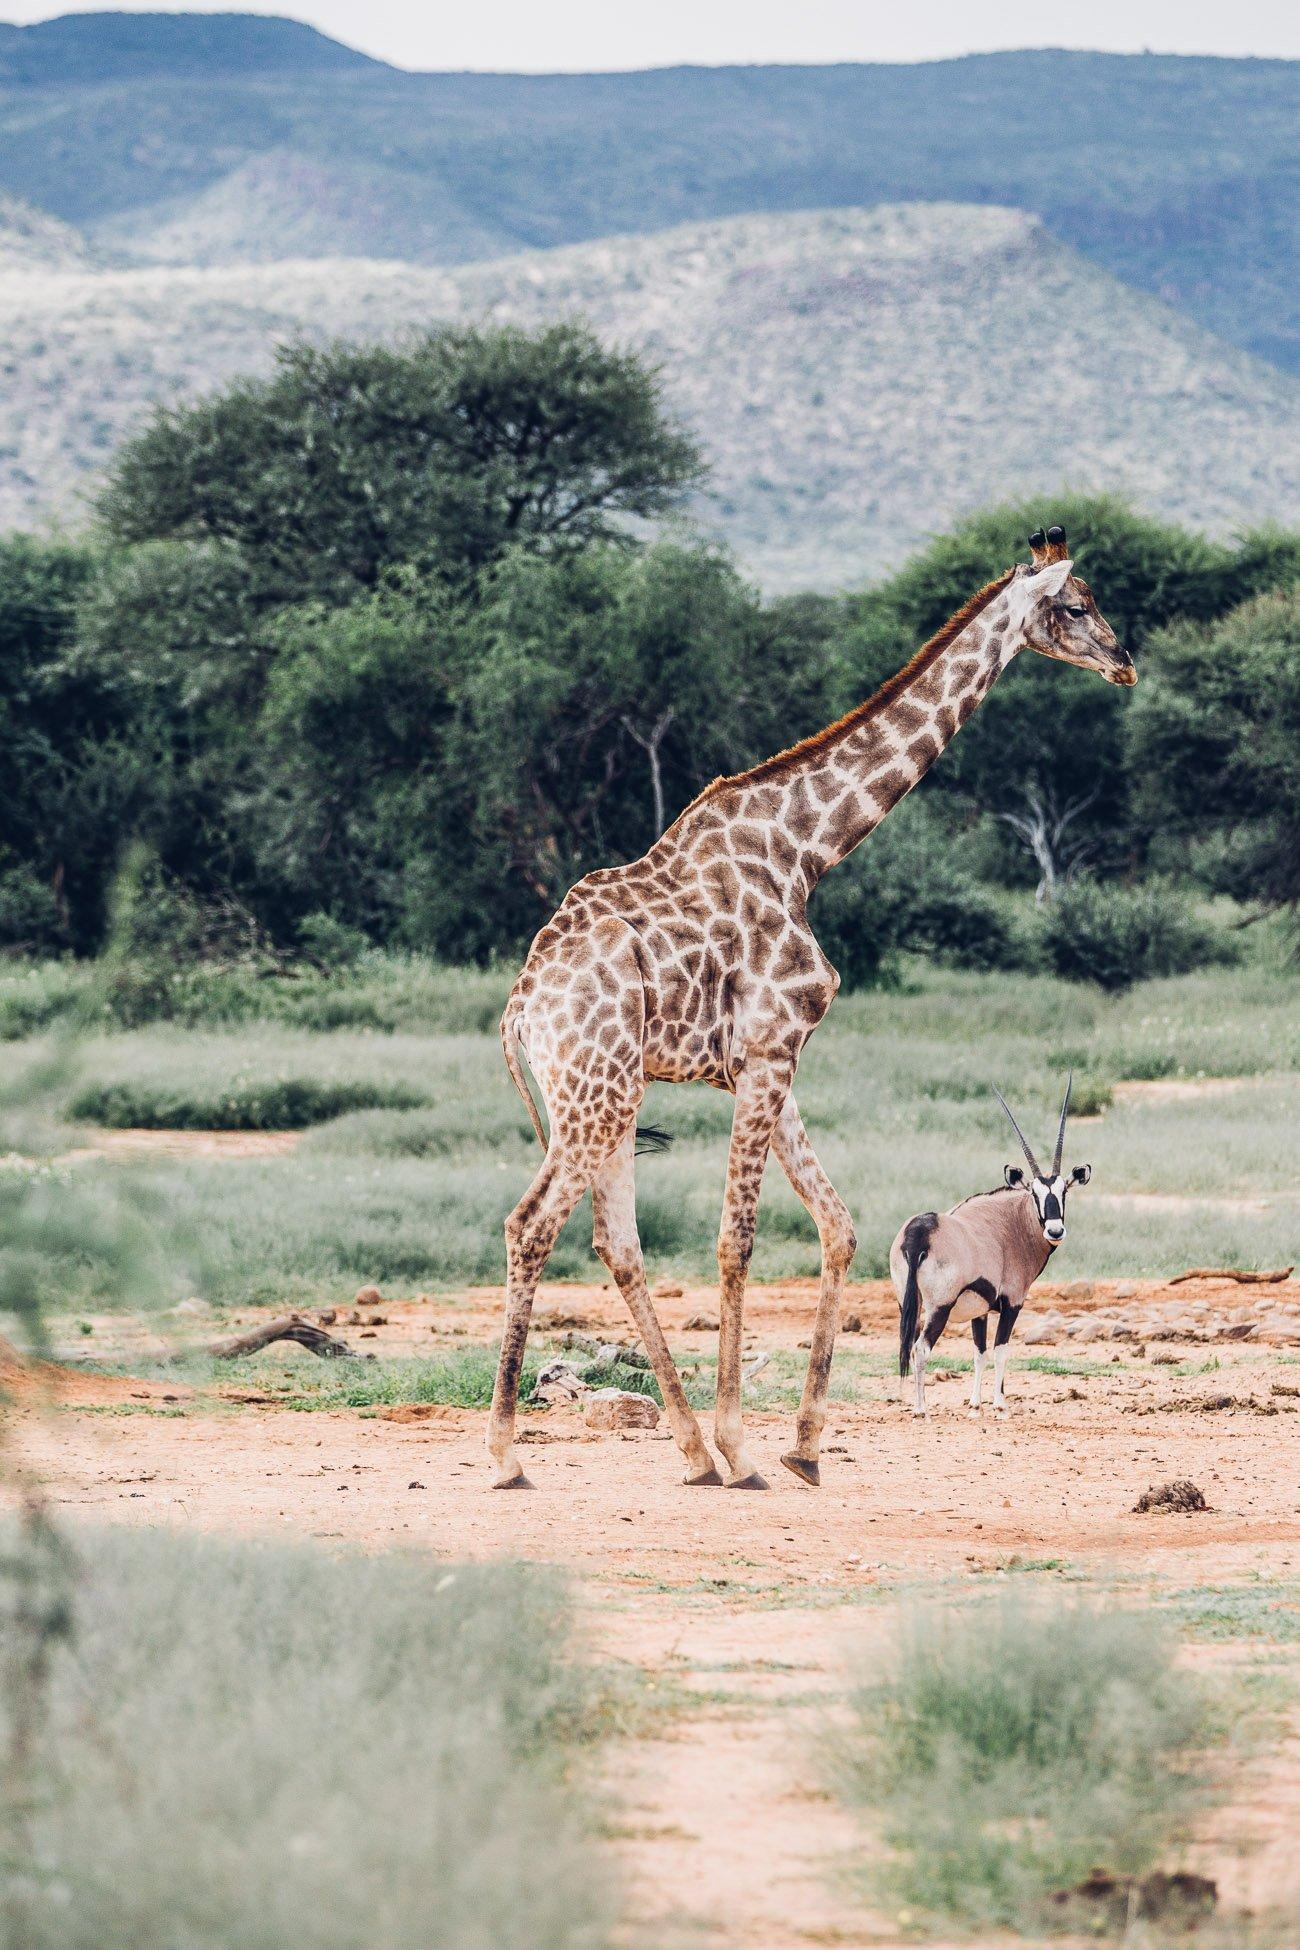 Giraffe and Oryx at a Safari in Namibia